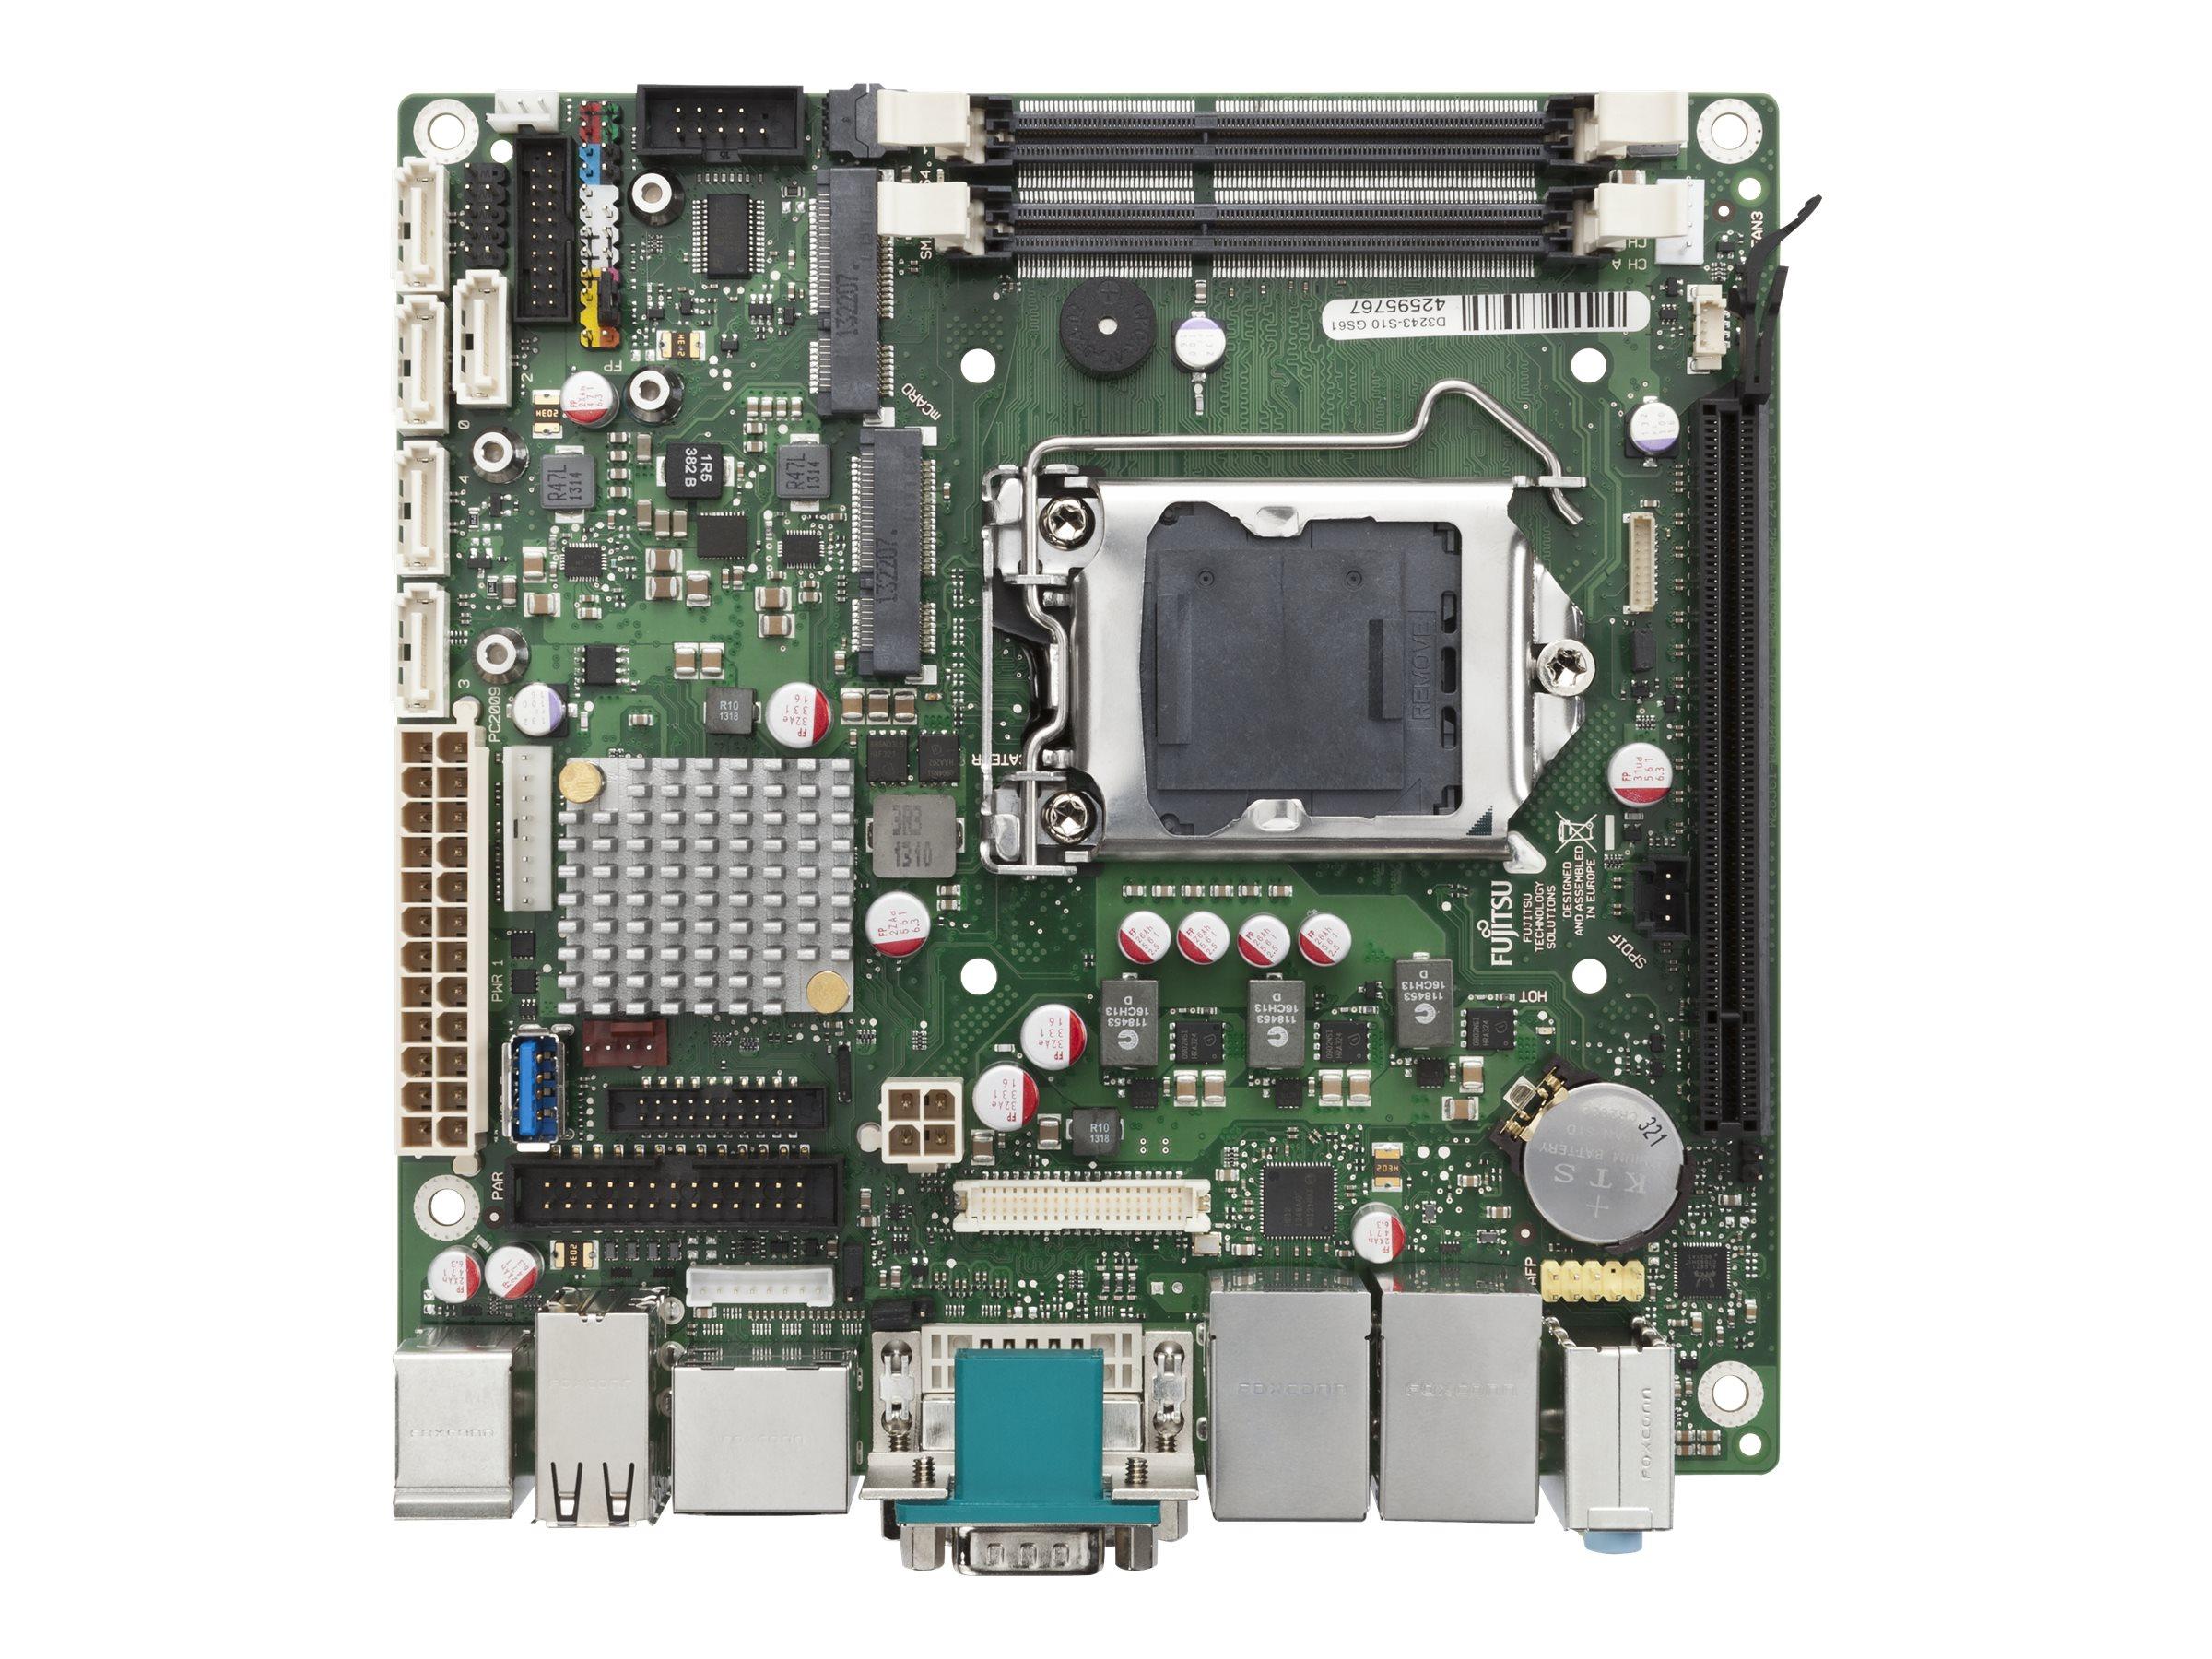 Fujitsu D3243-S - Motherboard - Mini-ITX - LGA1150-Sockel - Q87 - USB 3.0